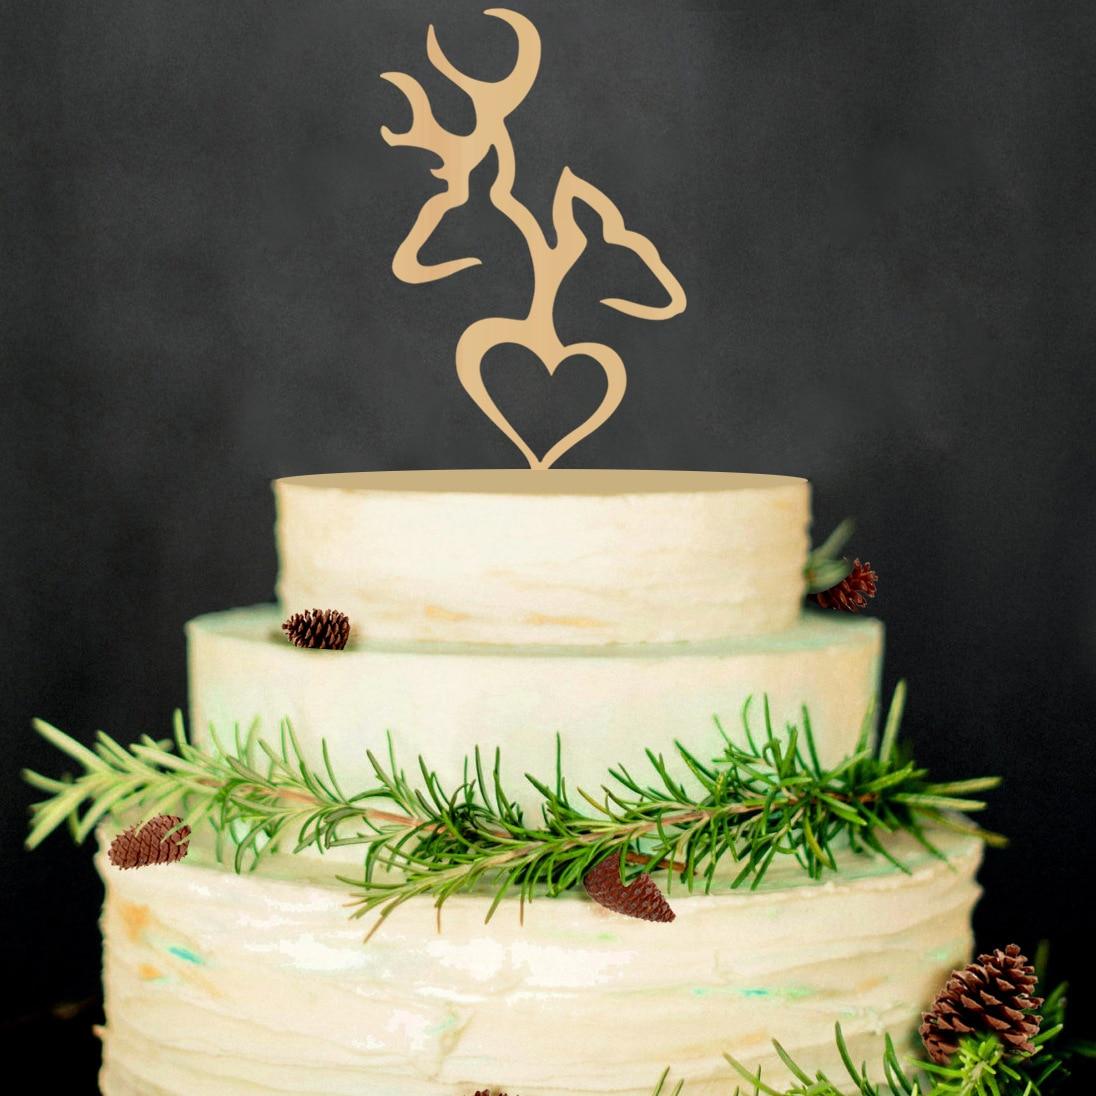 Wooden Heart Wedding Cake Topper